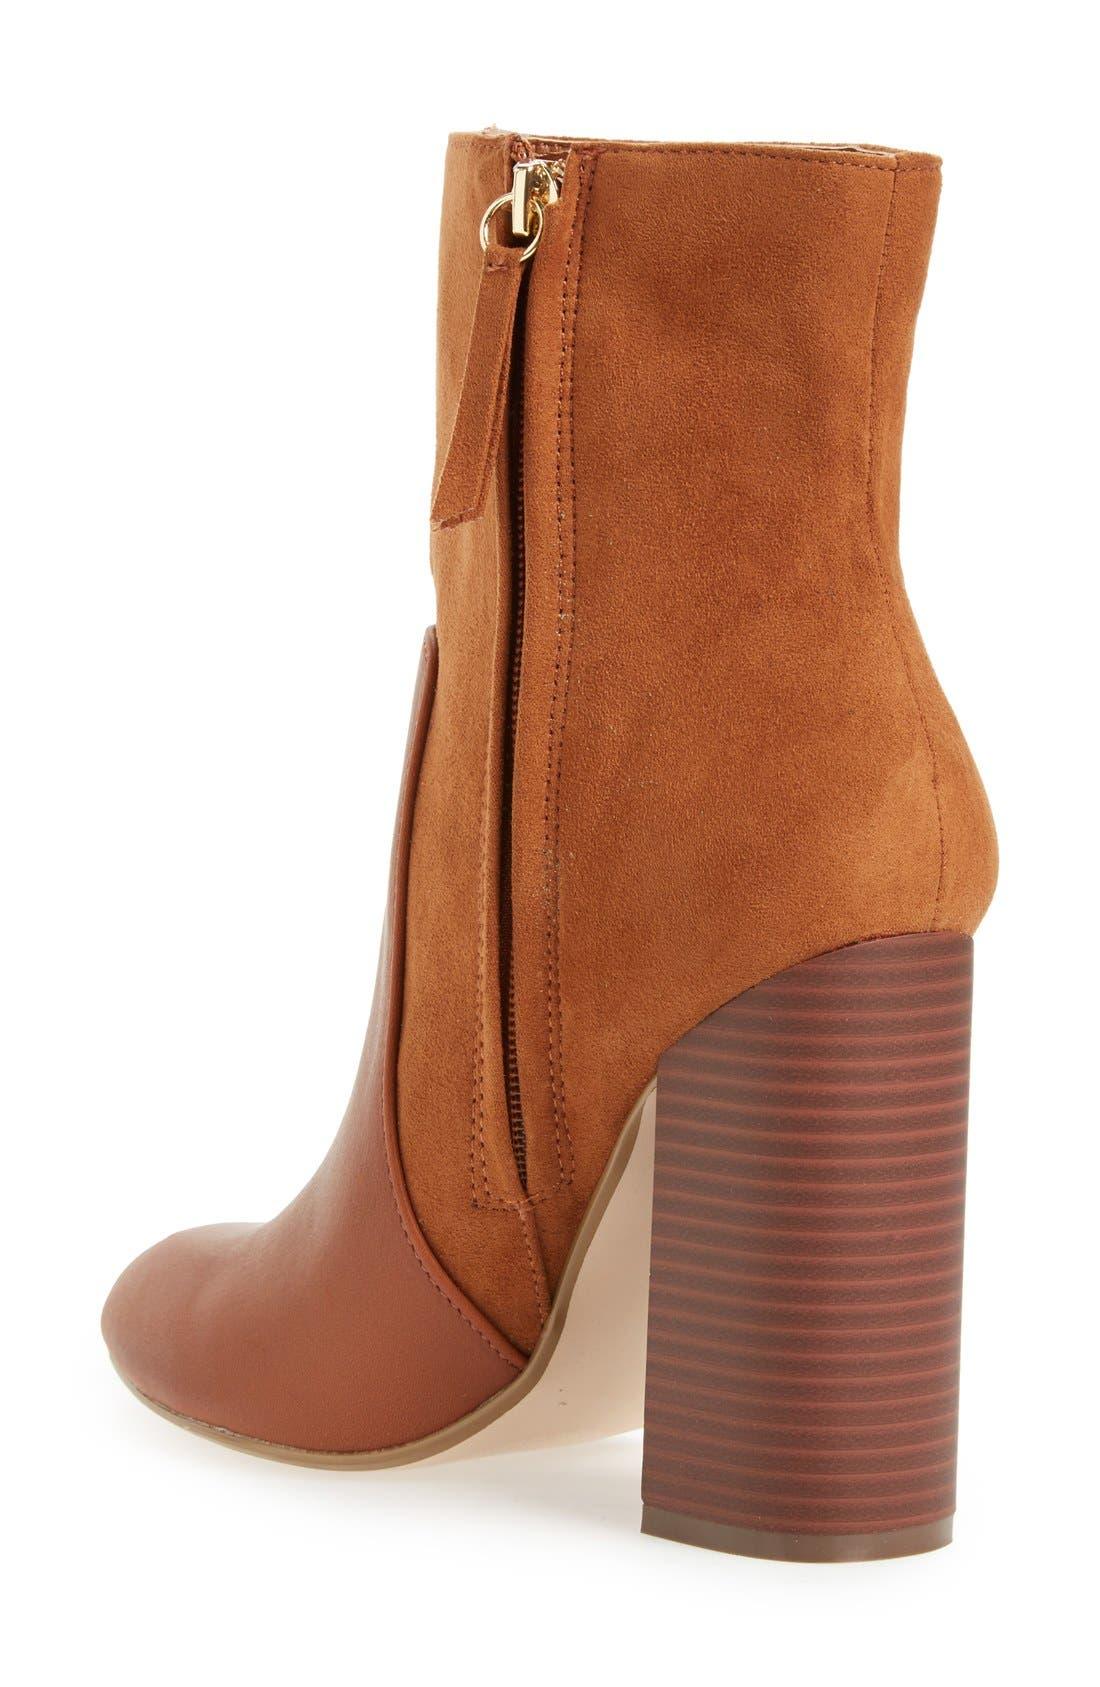 Alternate Image 2  - Athena Alexander 'Farren' Mid Calf Boot (Women)